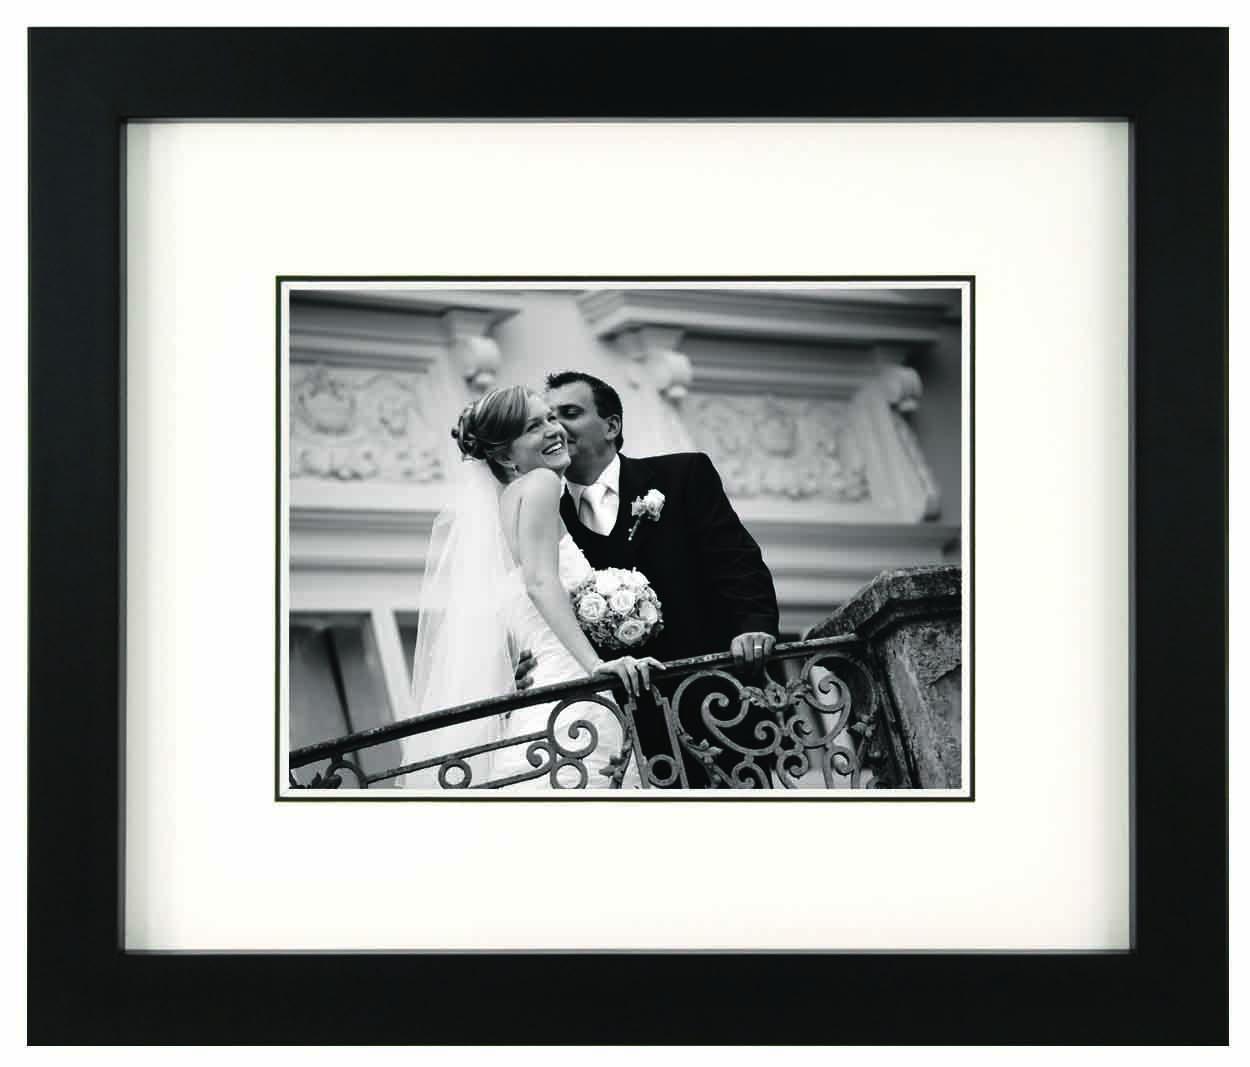 wedding frame.jpg